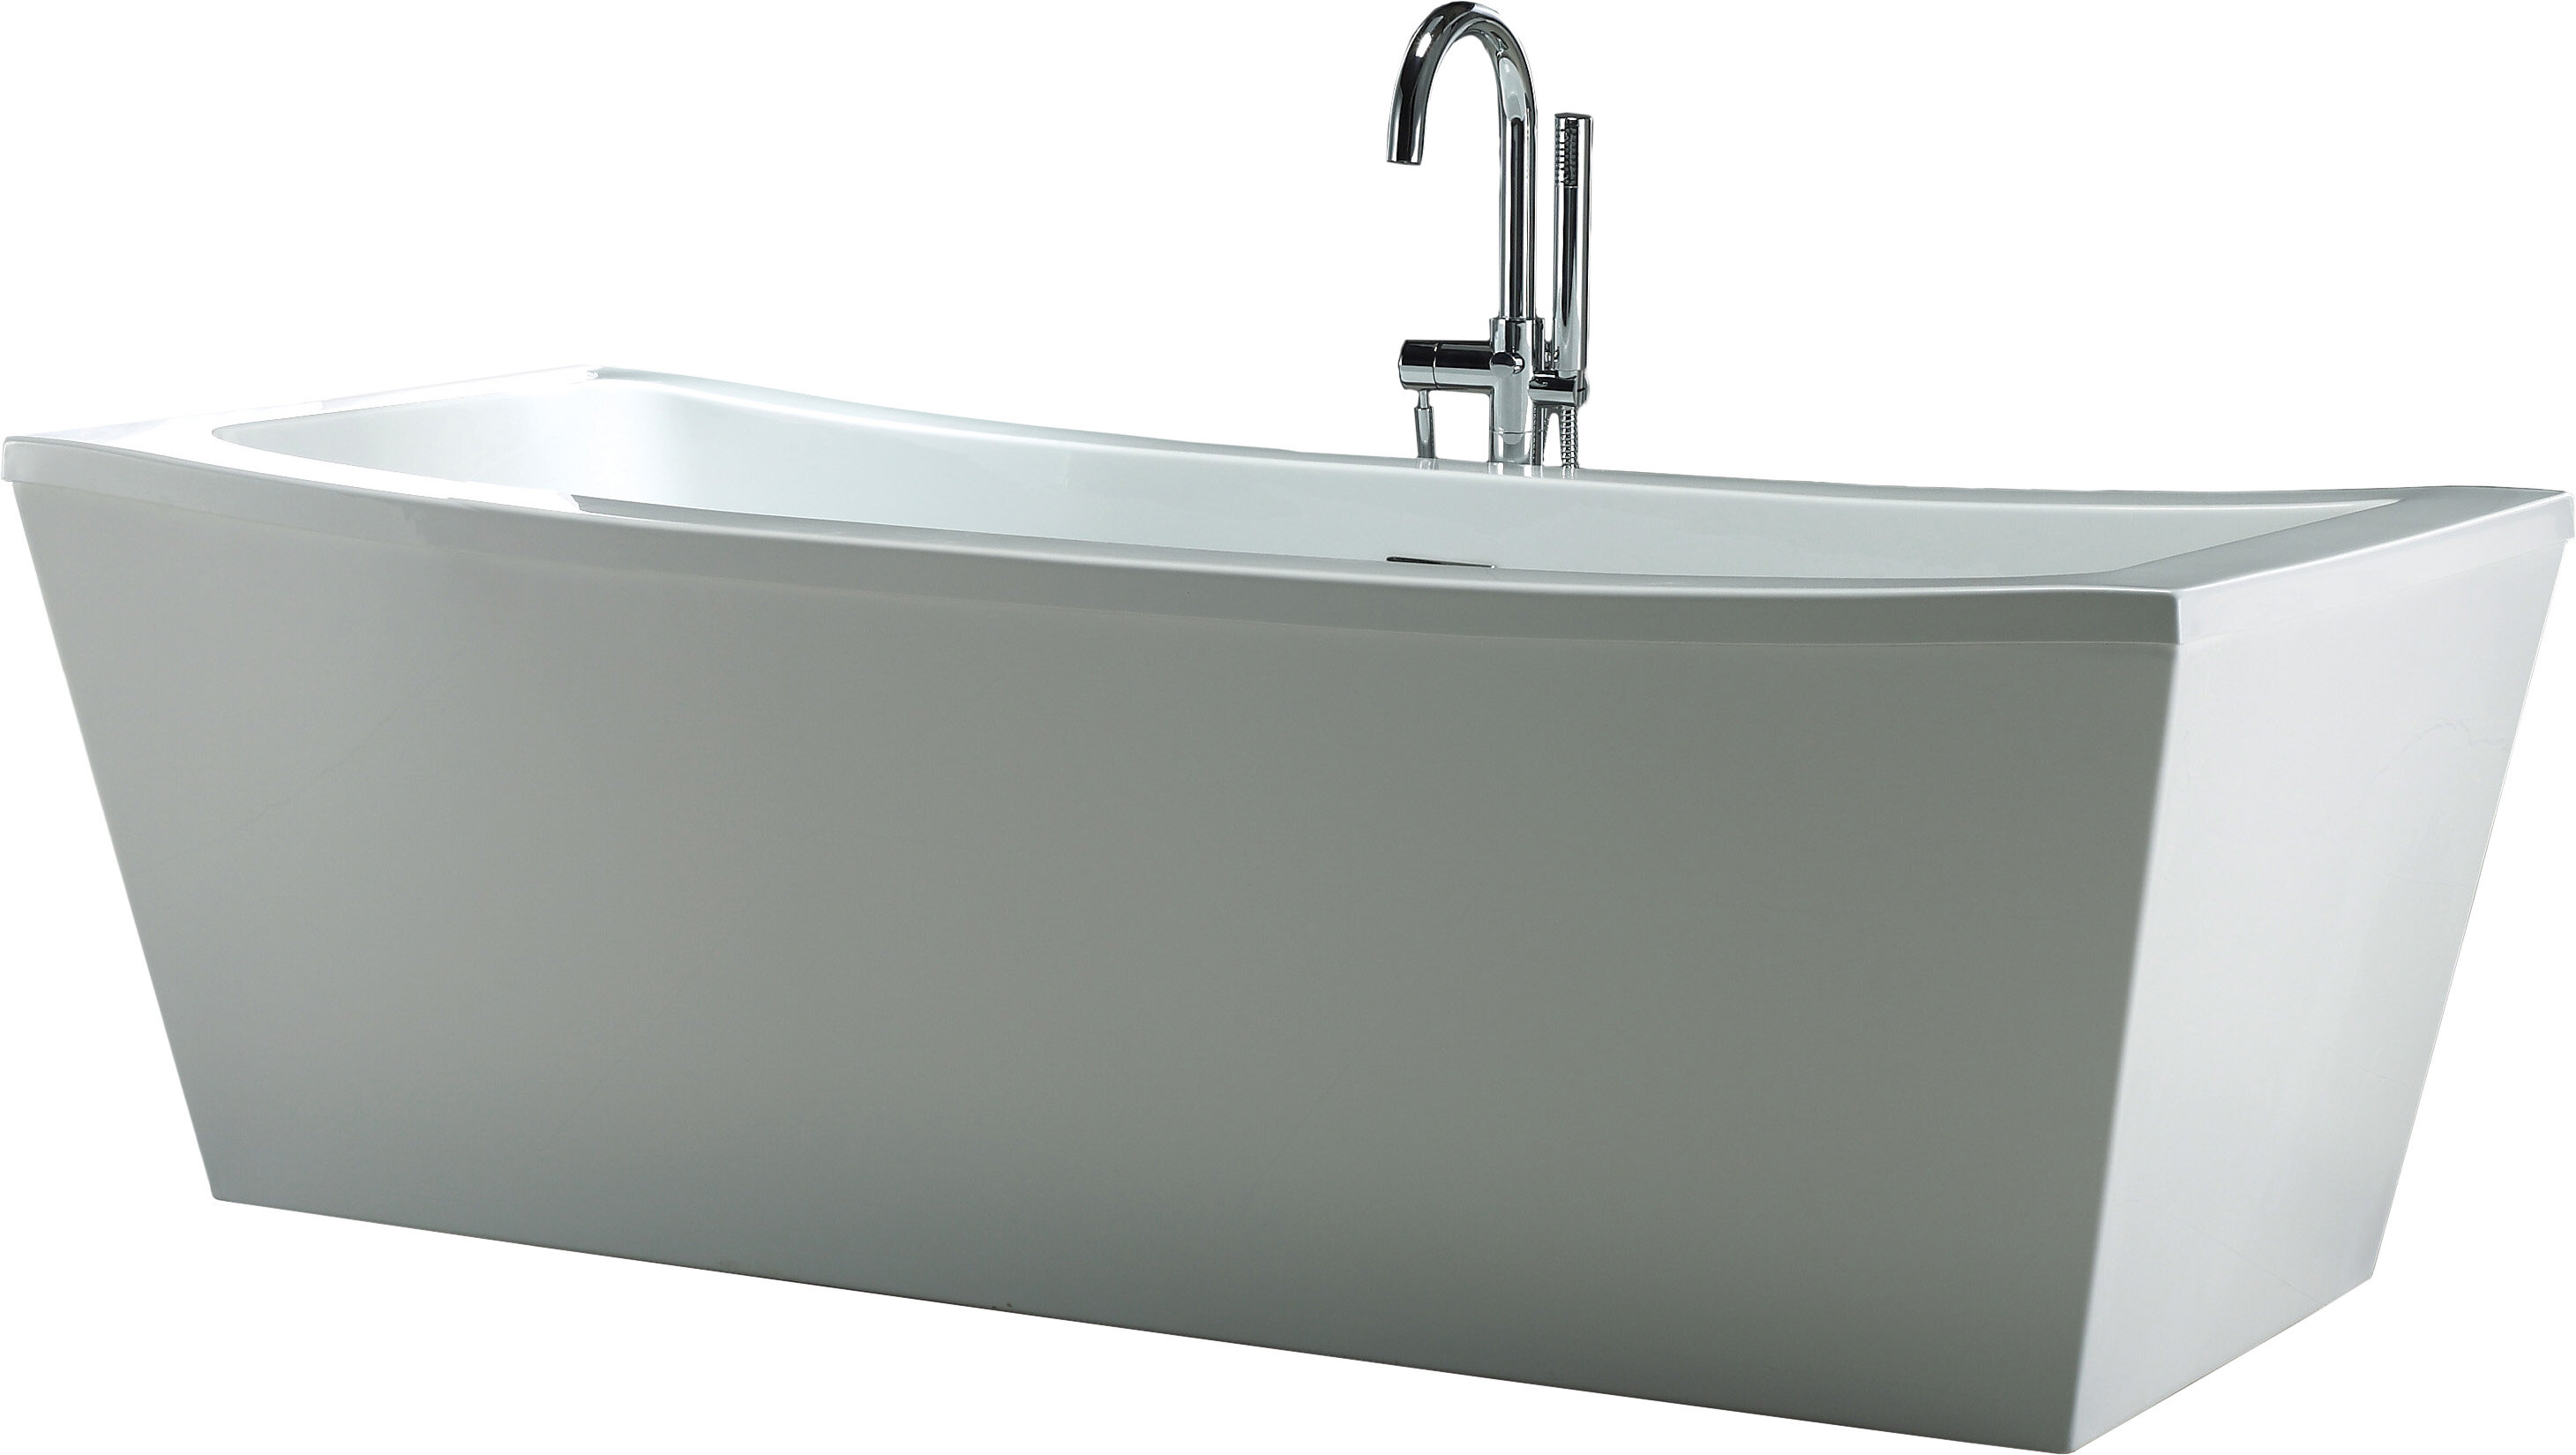 base sizesshower standard standardshower image tub size sizes sofa x of inspirations lovely shower full corner